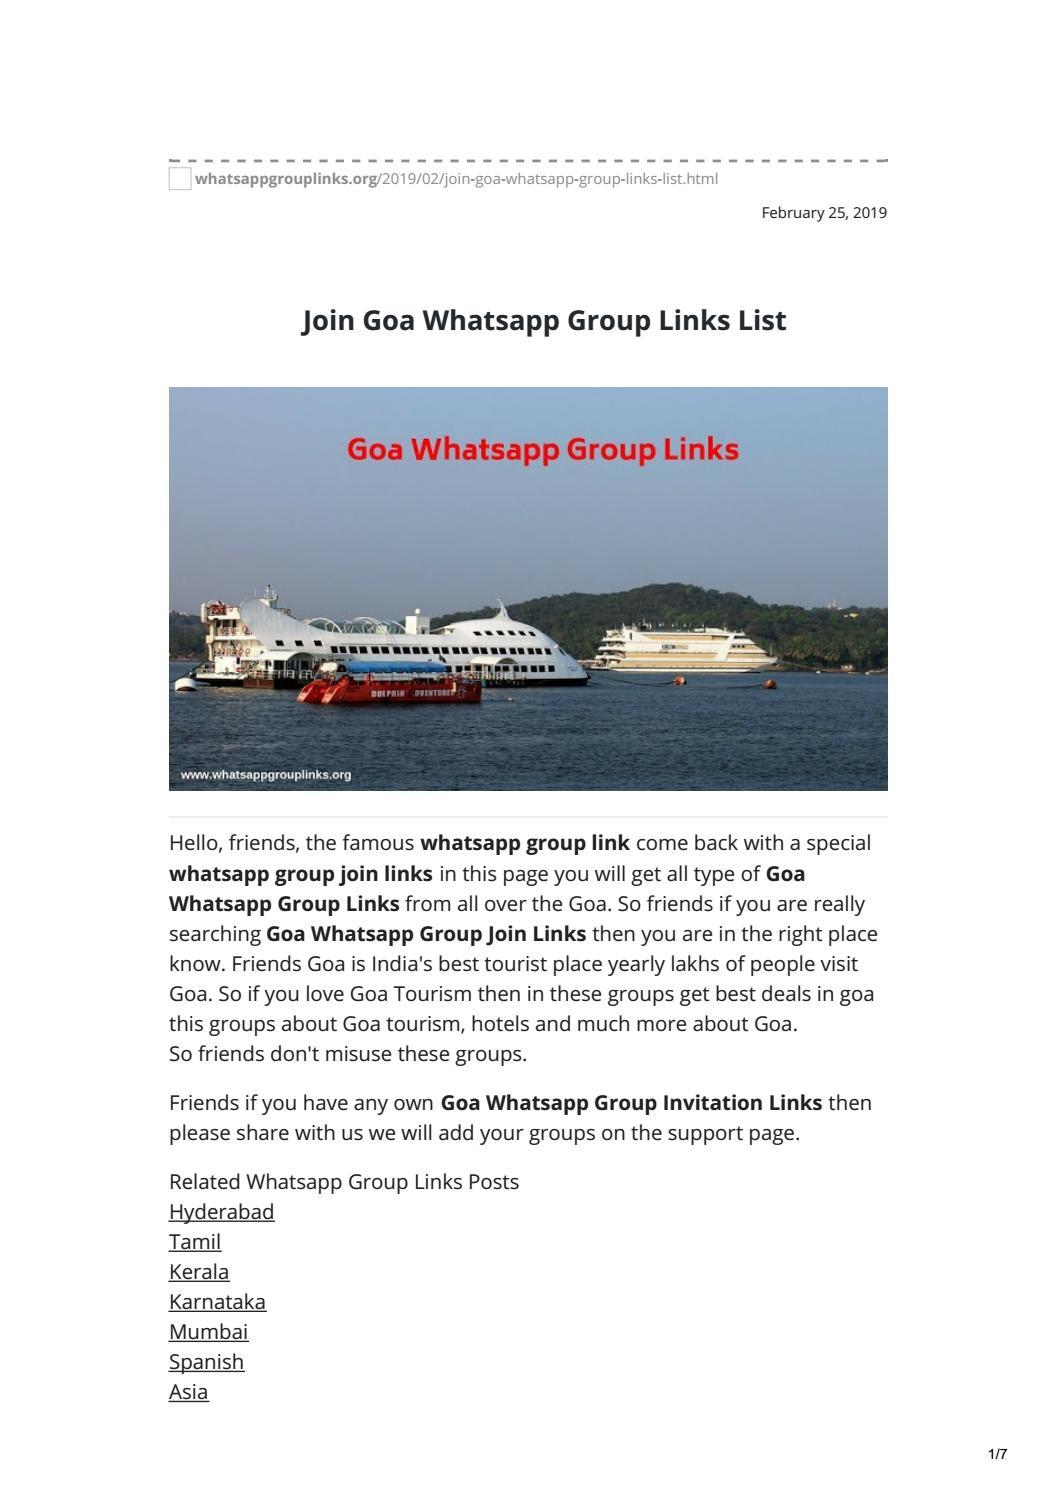 Join Goa Whatsapp Group Links List by whatsapp group links - issuu